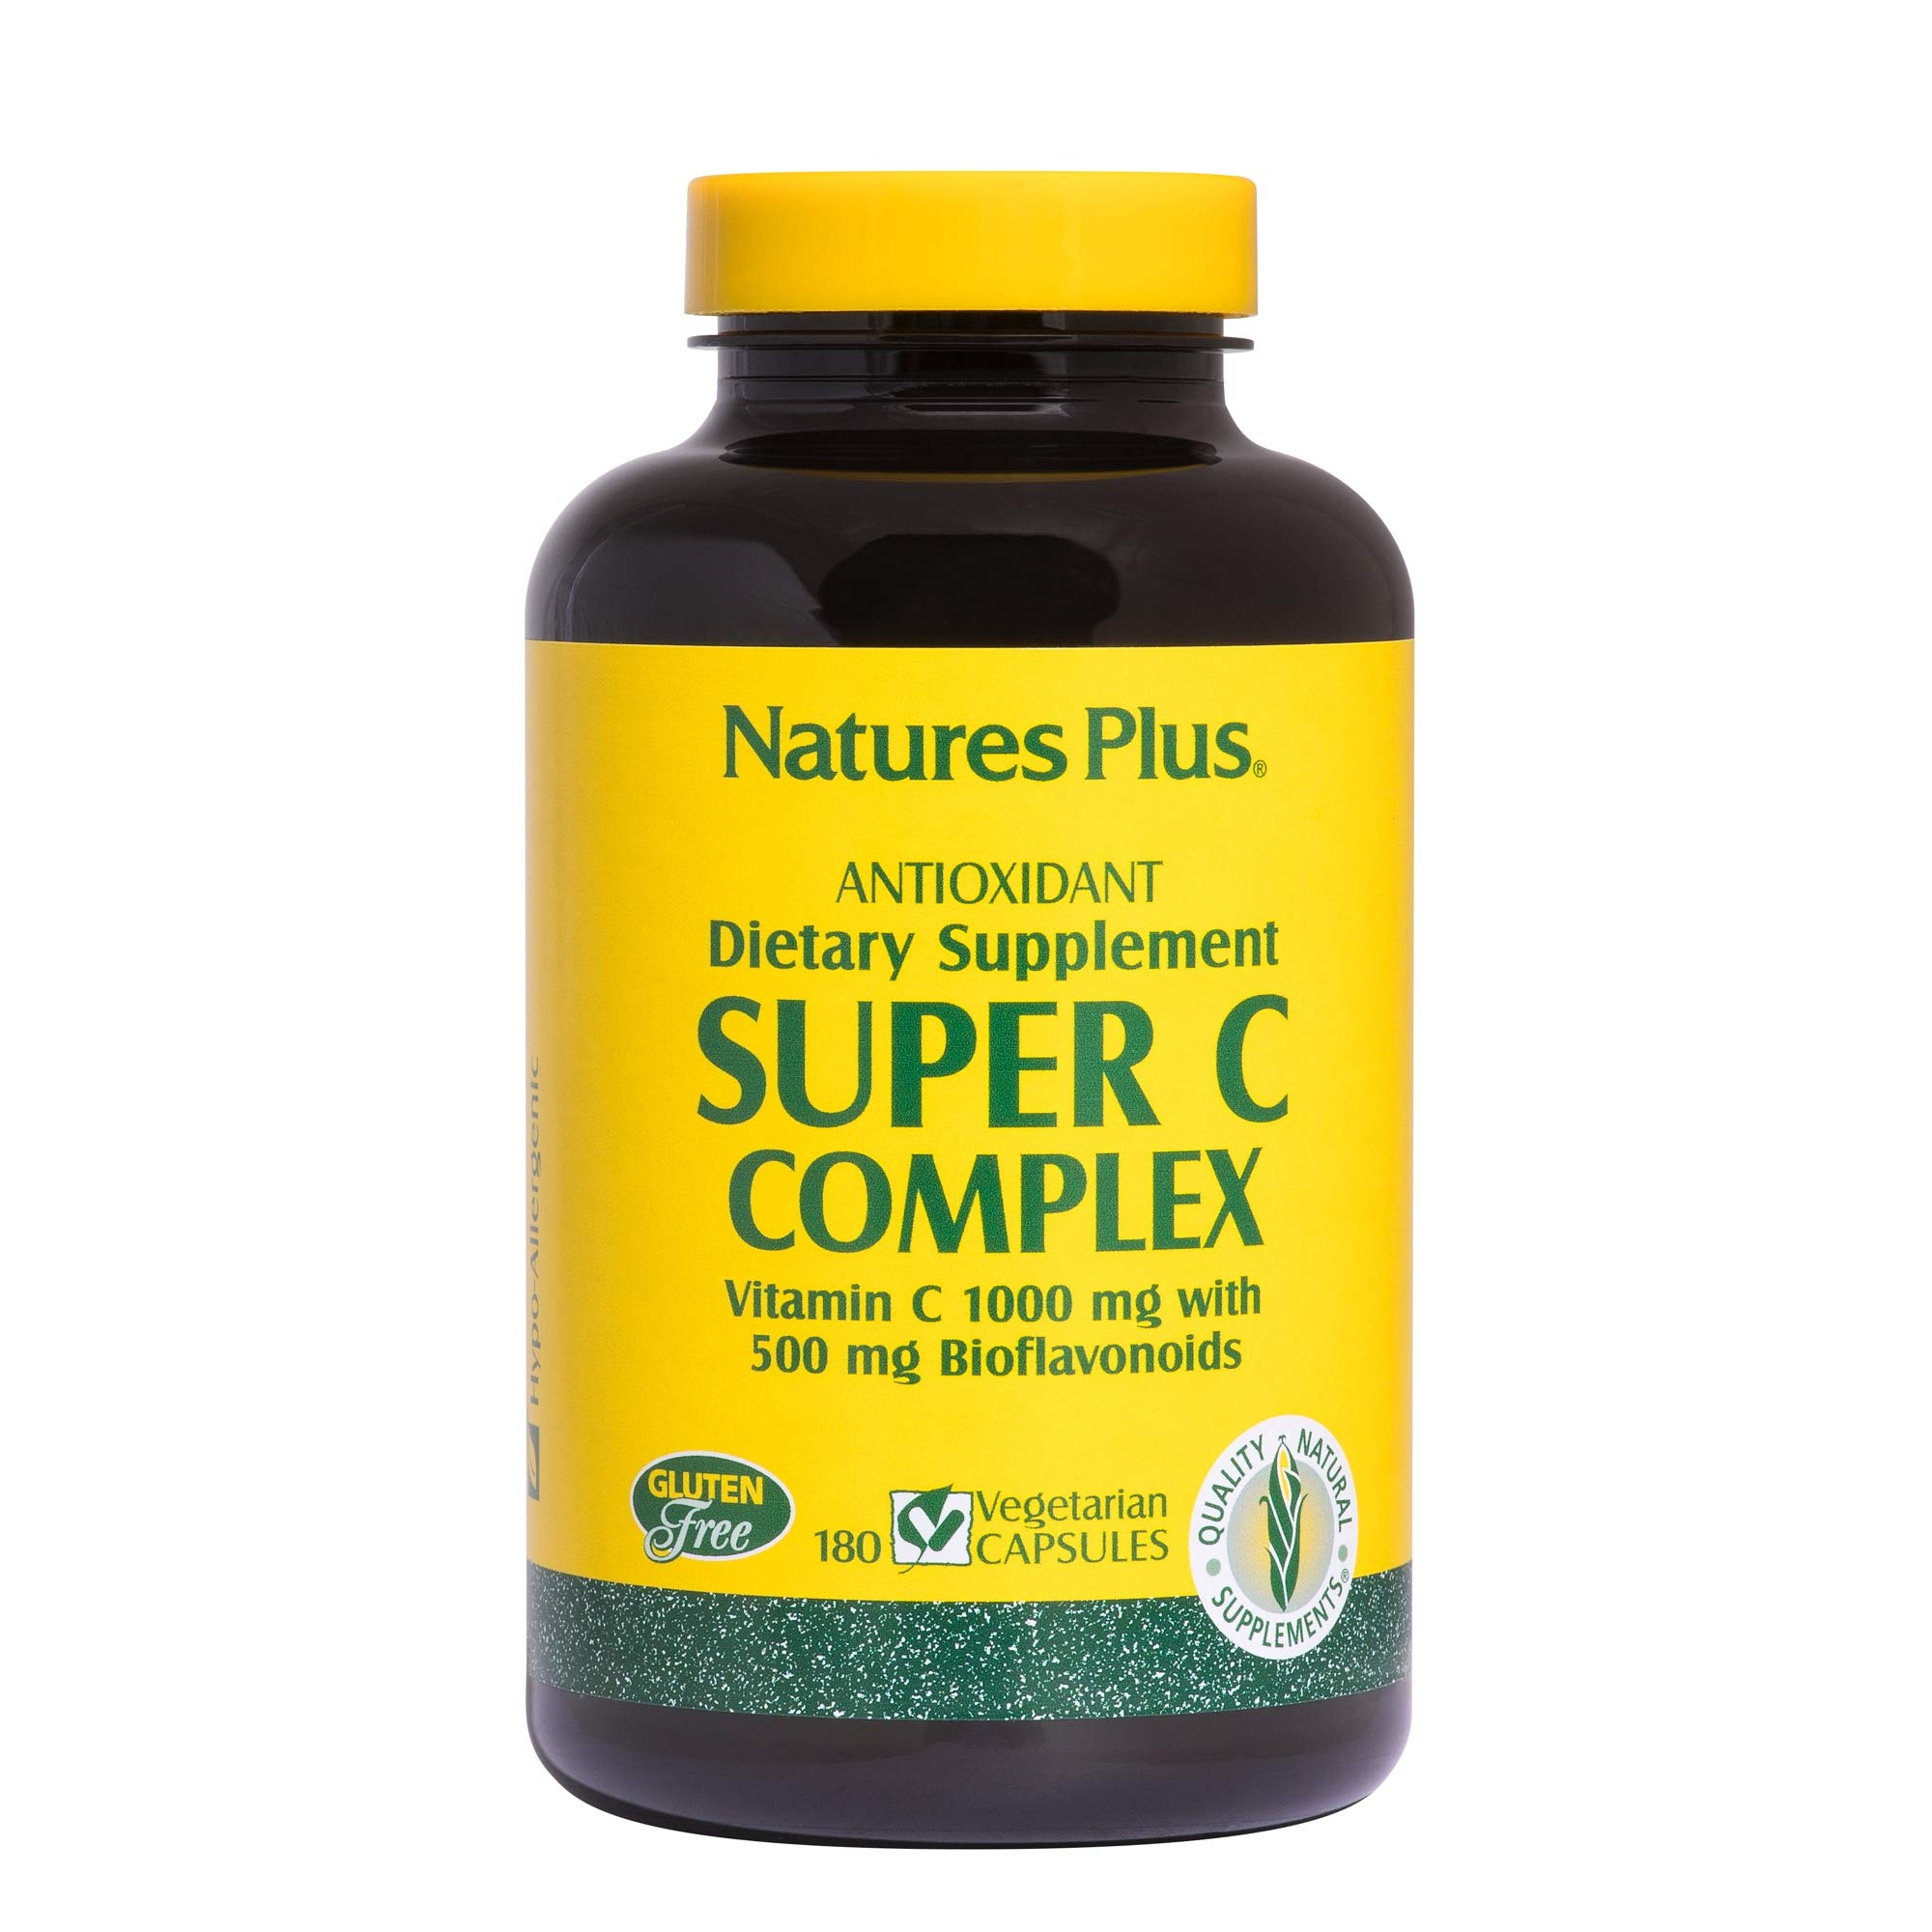 NaturesPlus Super C Complex - 1000 mg Ascorbic Acid - High Potency Vitamin C Immune Support Supplement, Antioxidant - 180 Vegetarian Capsules (90 Servings)